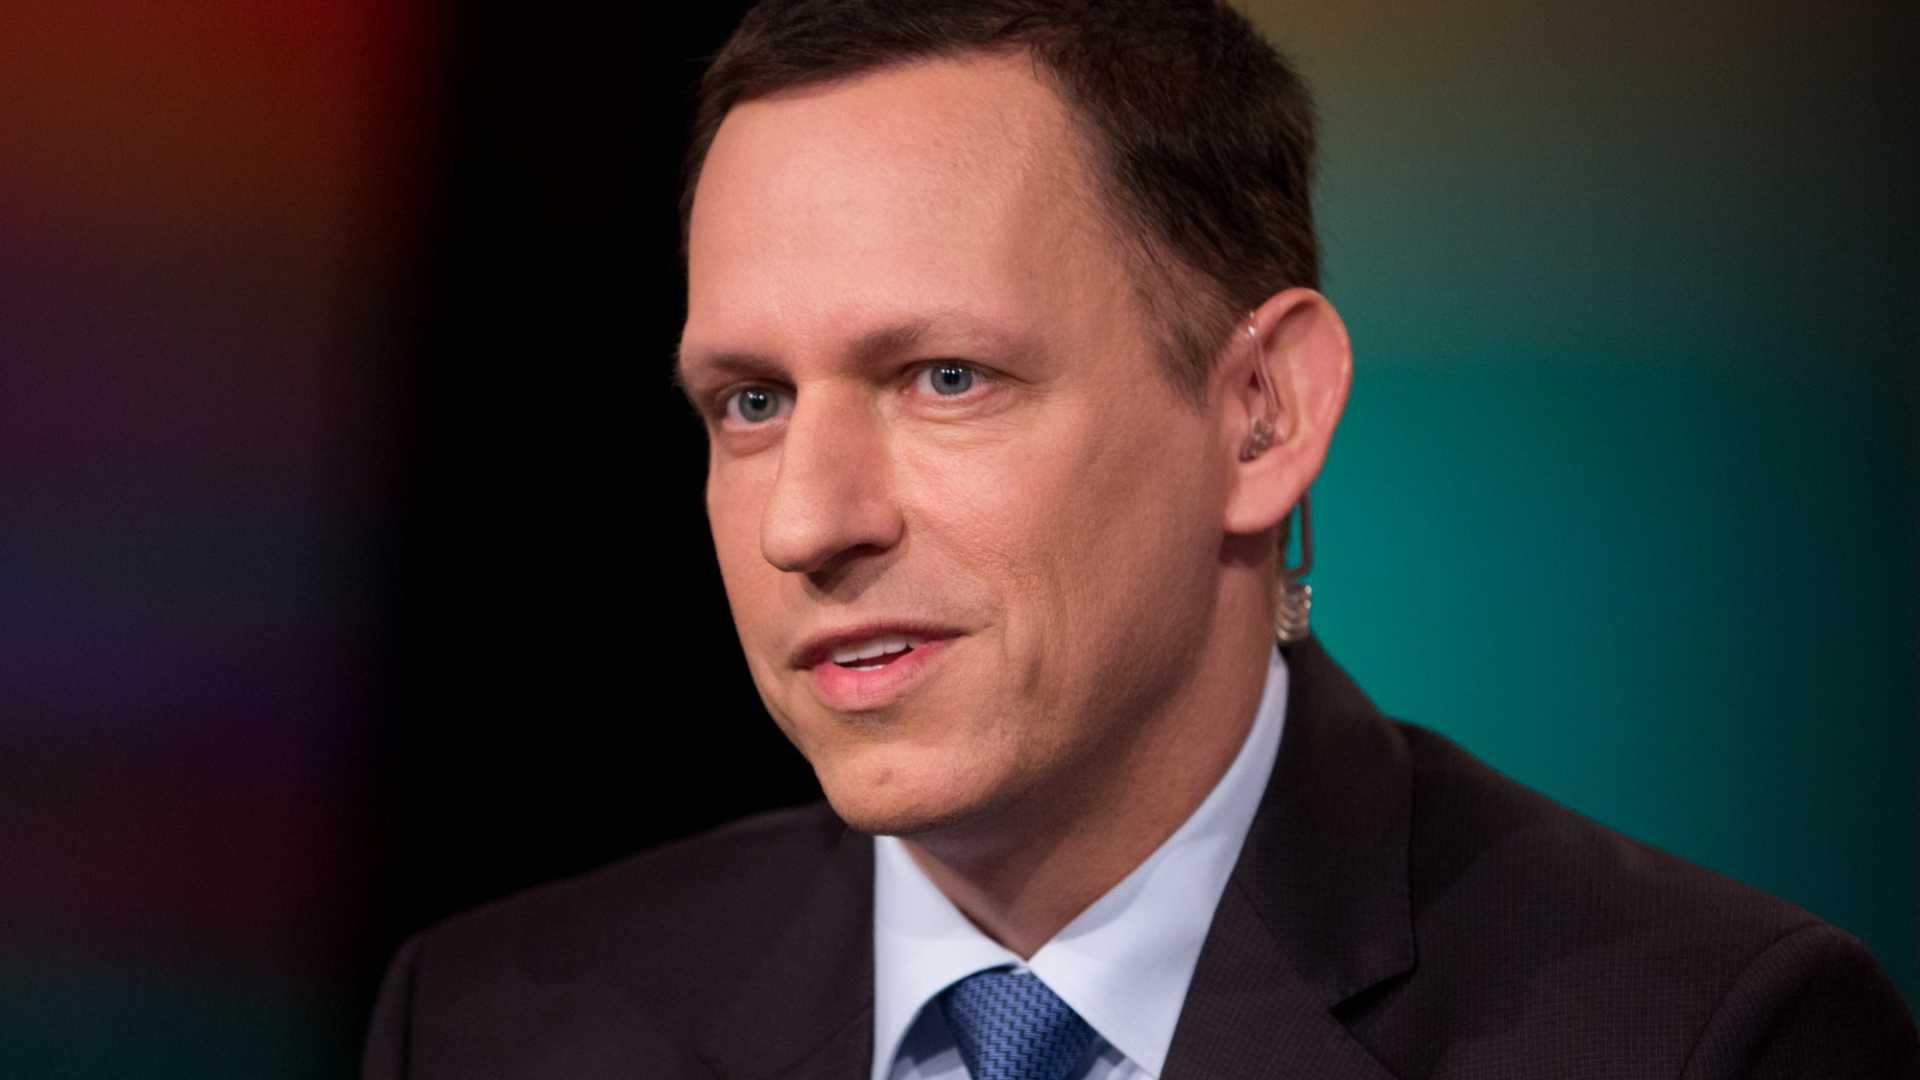 Peter Thiel's Palantir Just Raised $450 Million